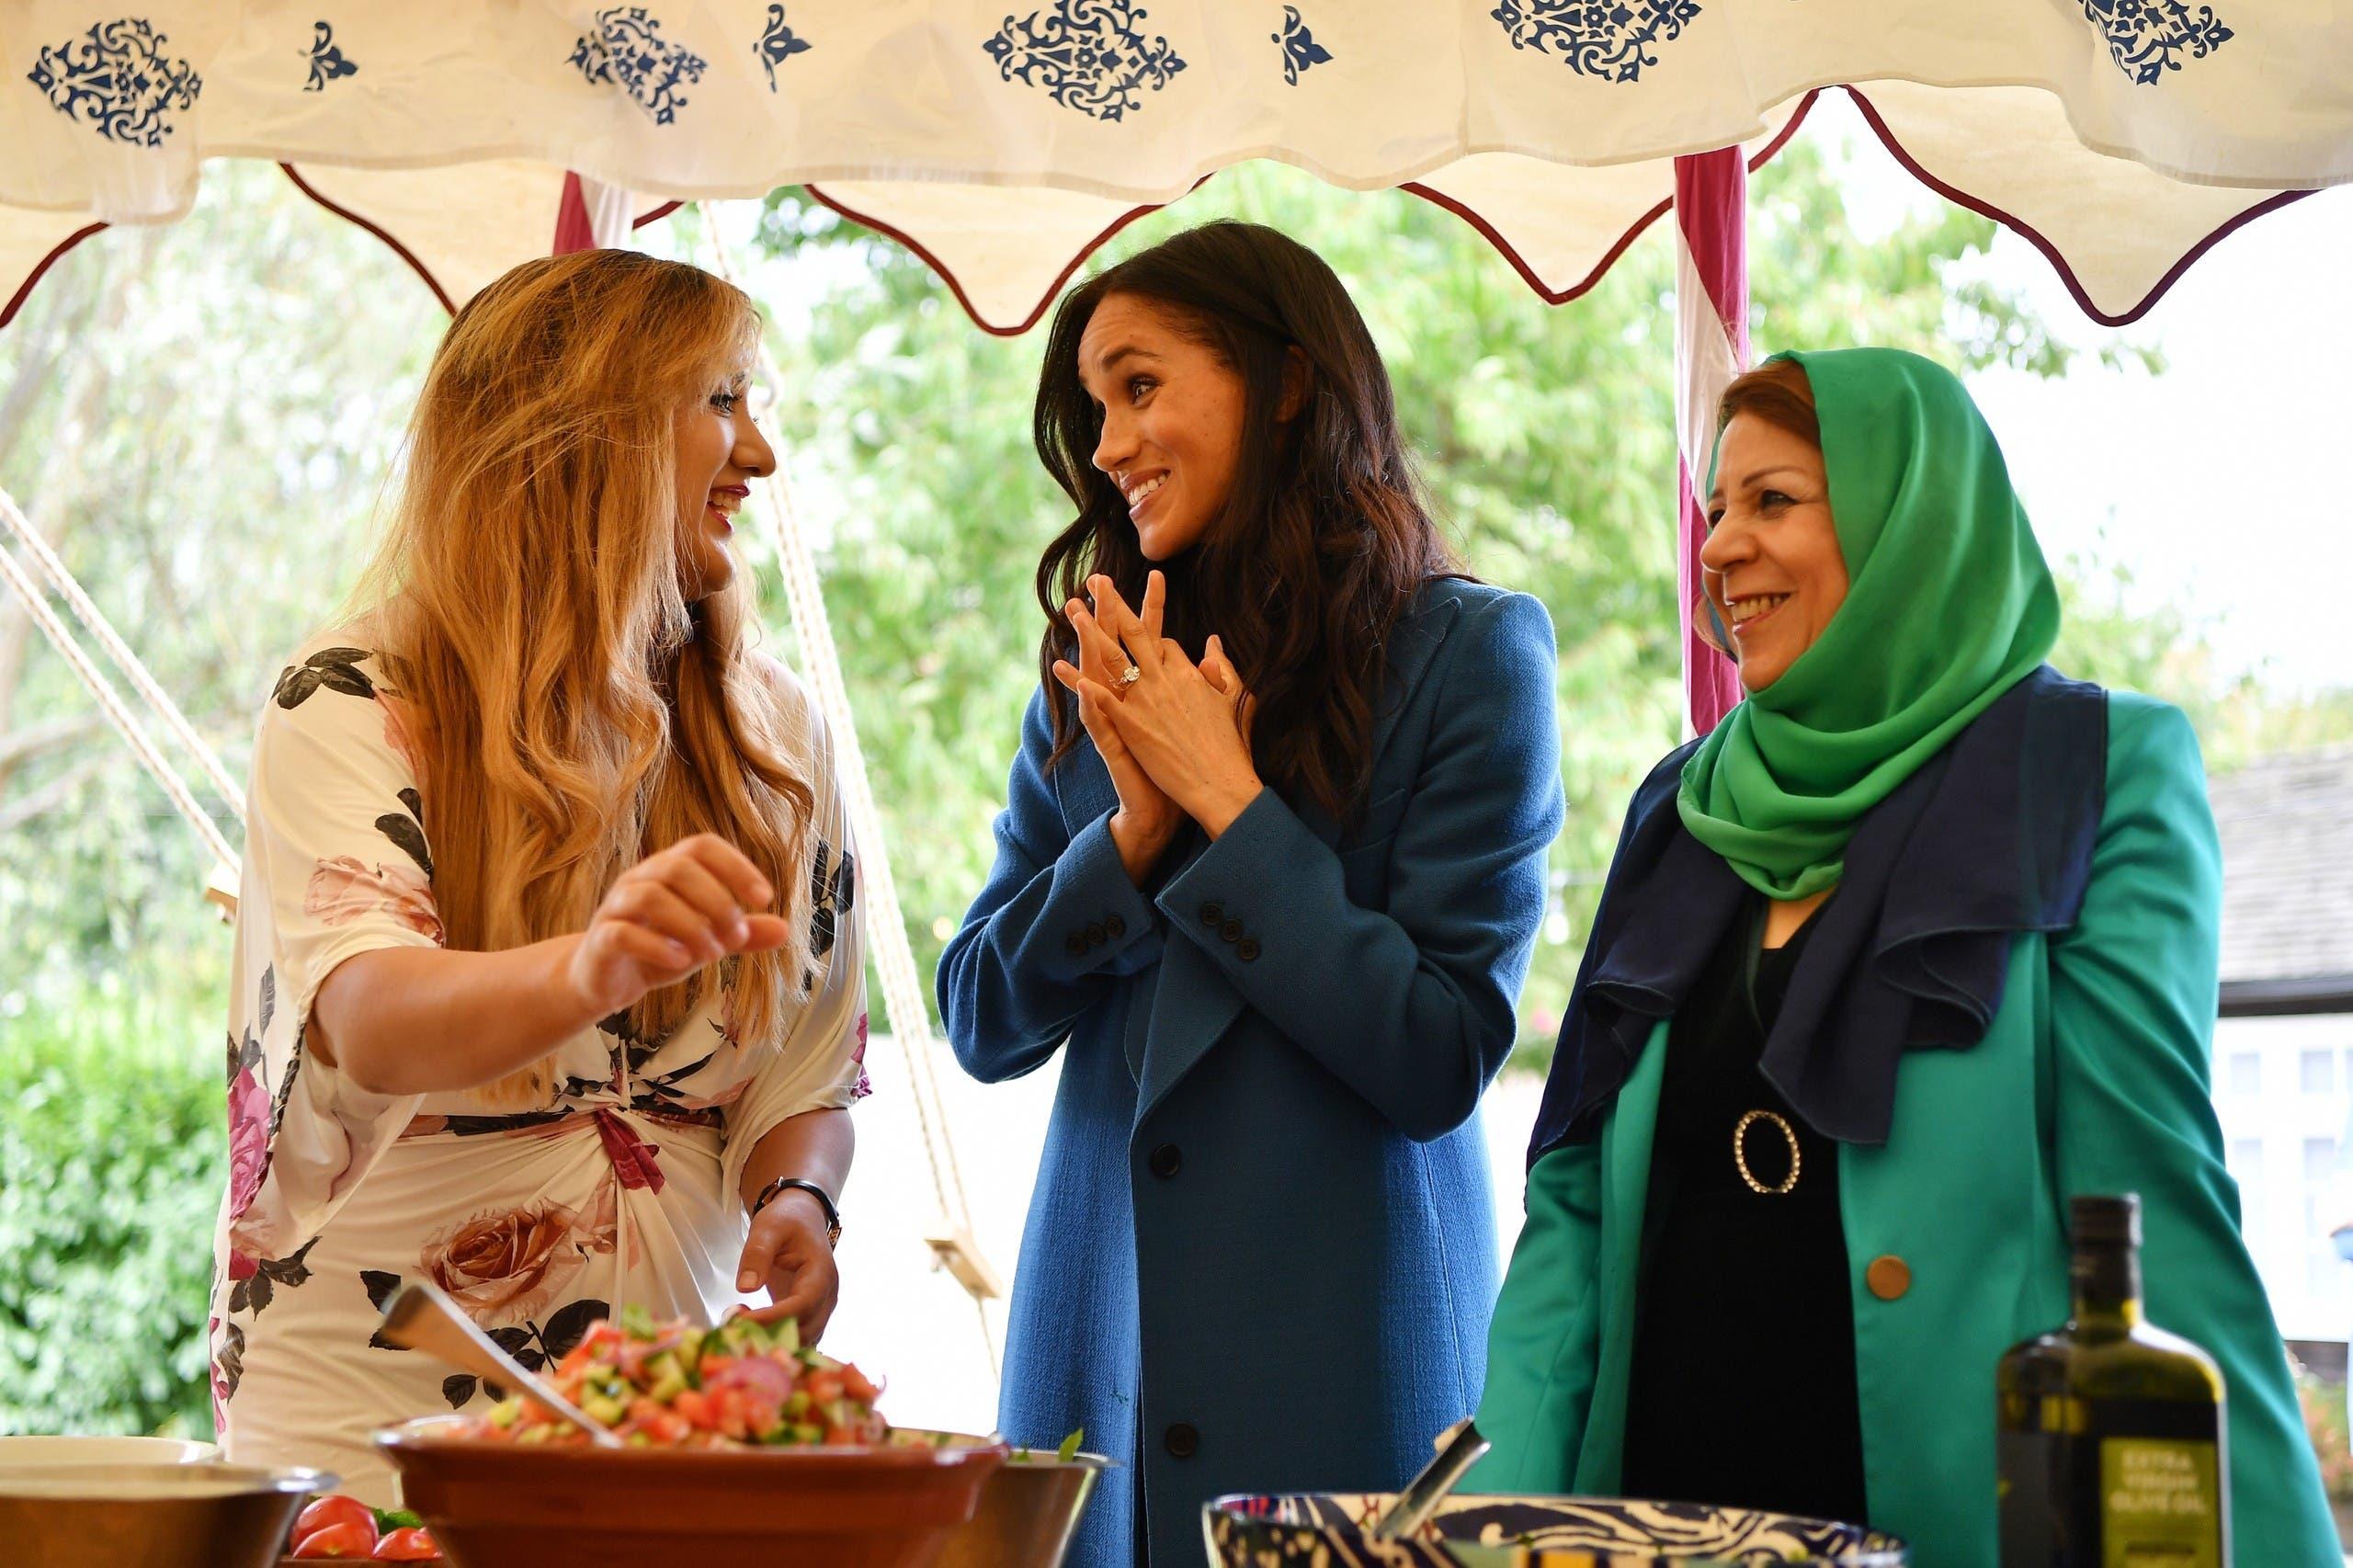 fadd2354 ddce 4da2 9f2c faafe40ecafe أم ميغان ميركل تشارك ابنتها العمل الخيري لصالح المسلمين  ونشر وصفات الطعام!!!